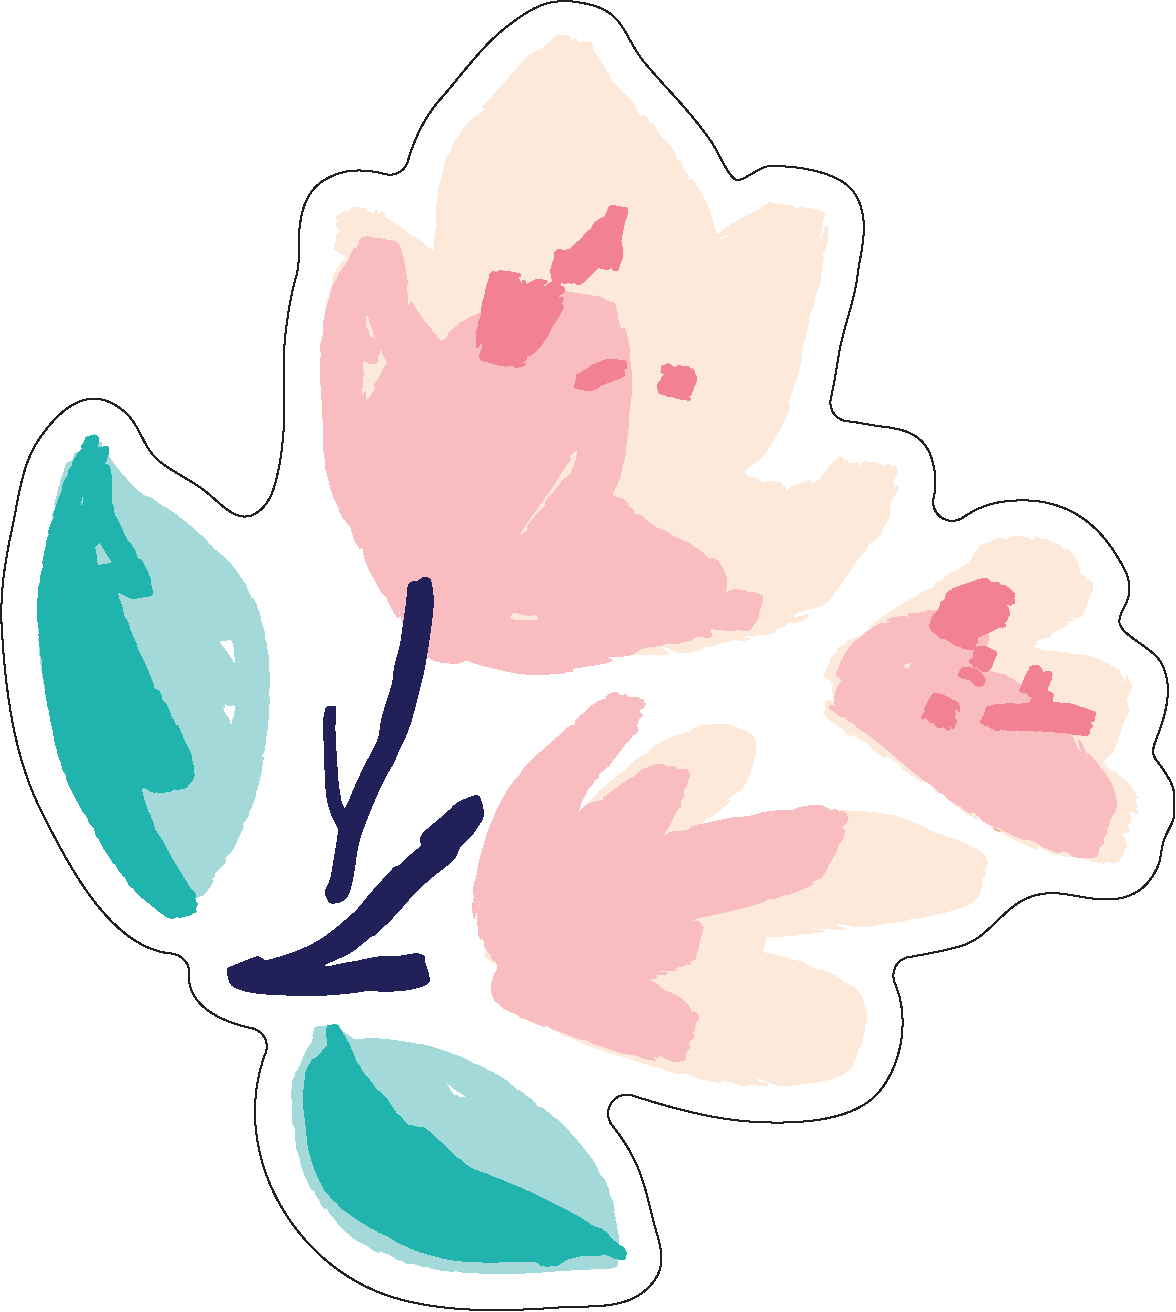 Let's Travel Flower #2 Print & Cut File